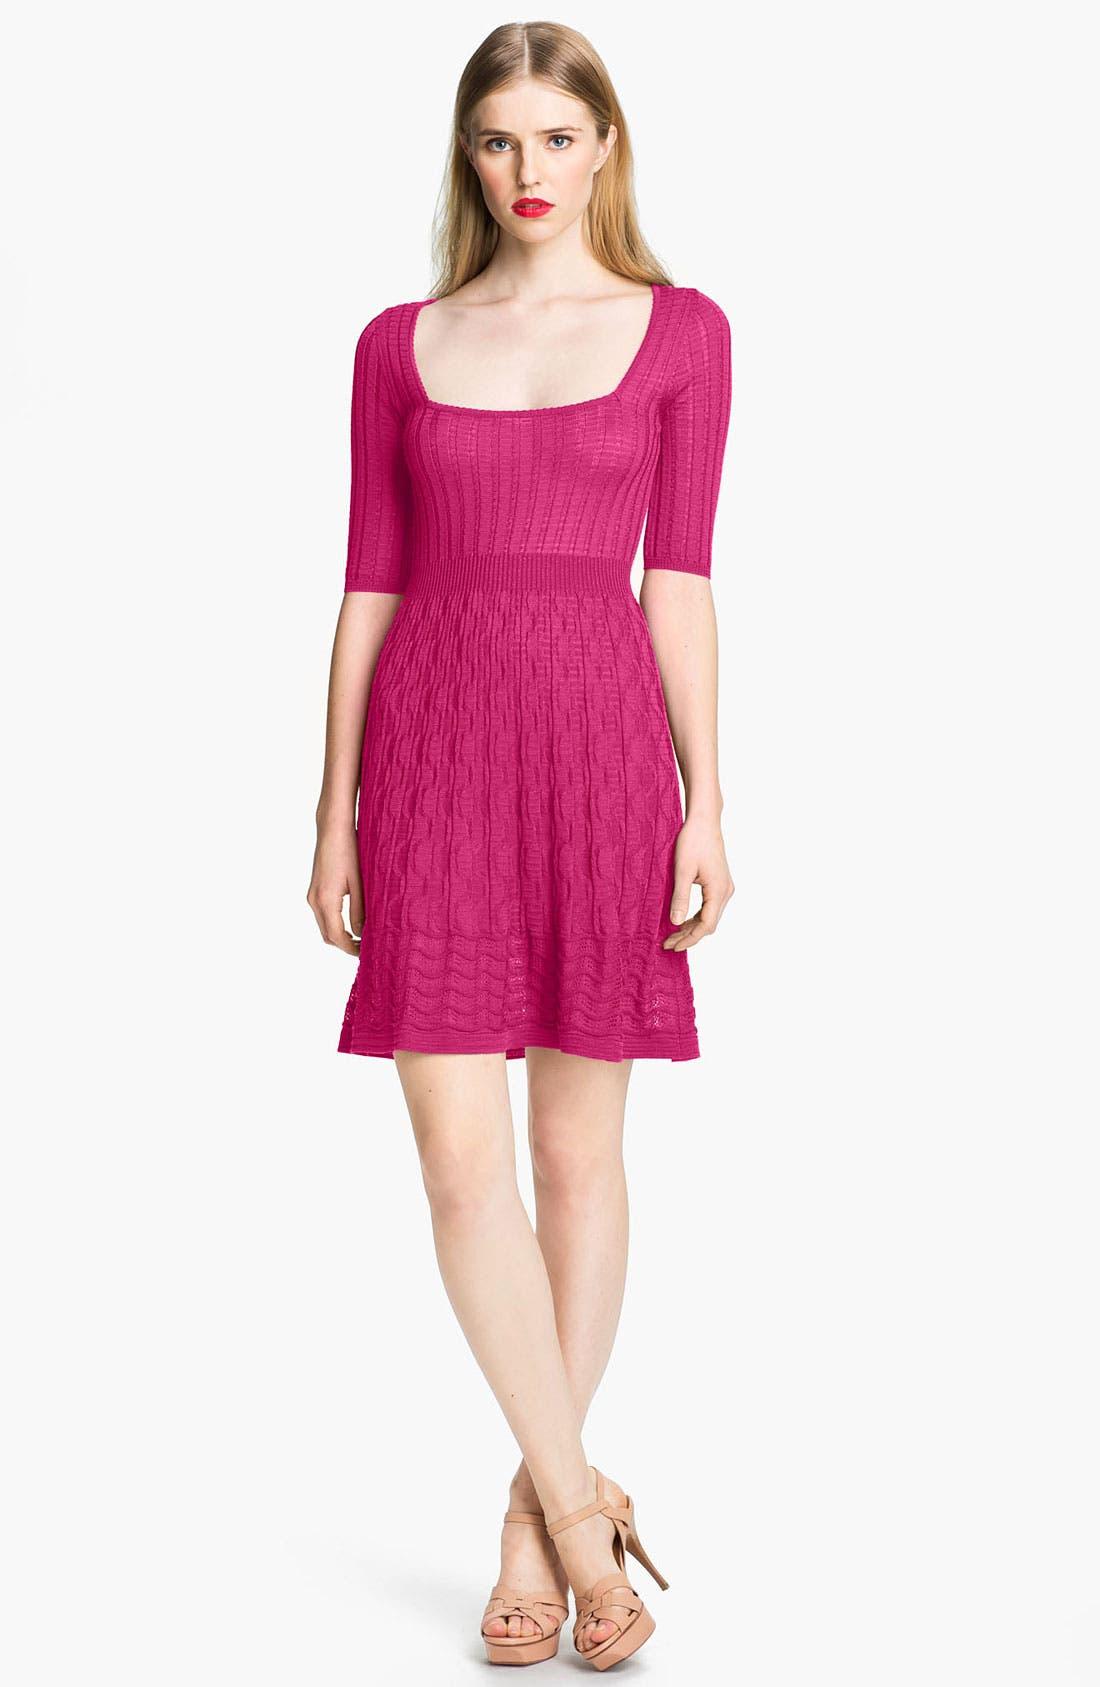 Alternate Image 1 Selected - M Missoni Knit Dress